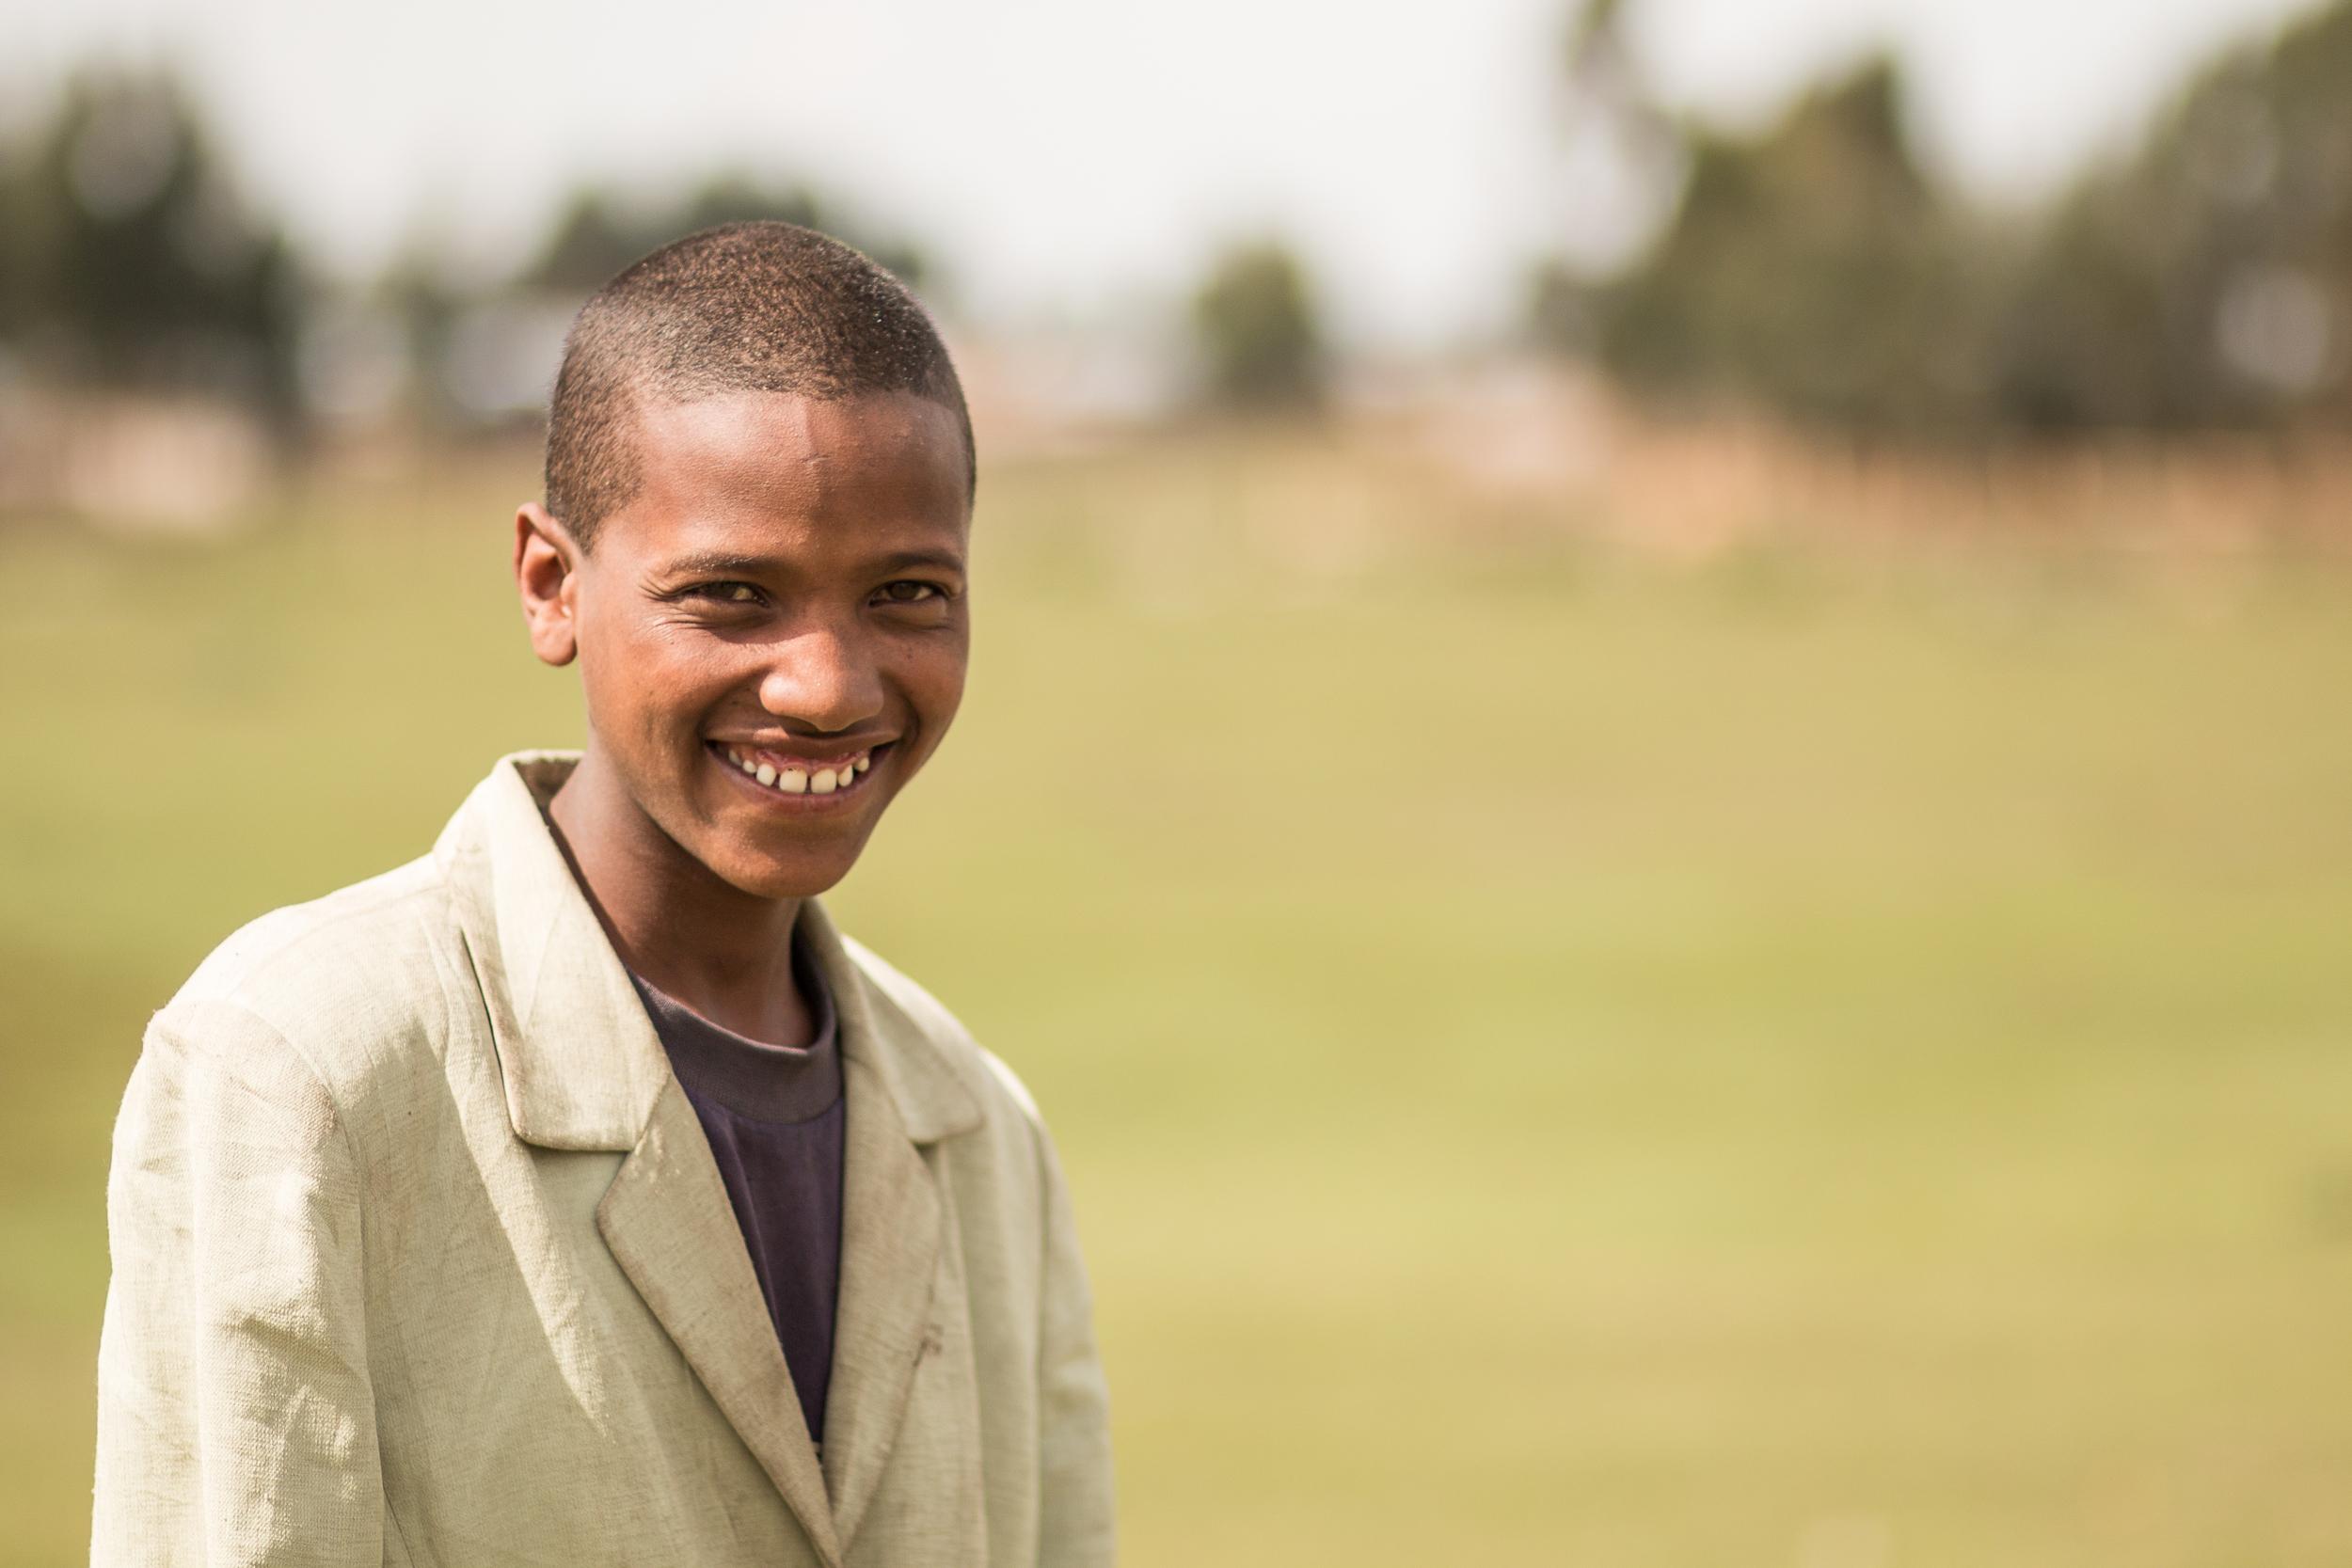 ethiopia_portraits-8990.JPG